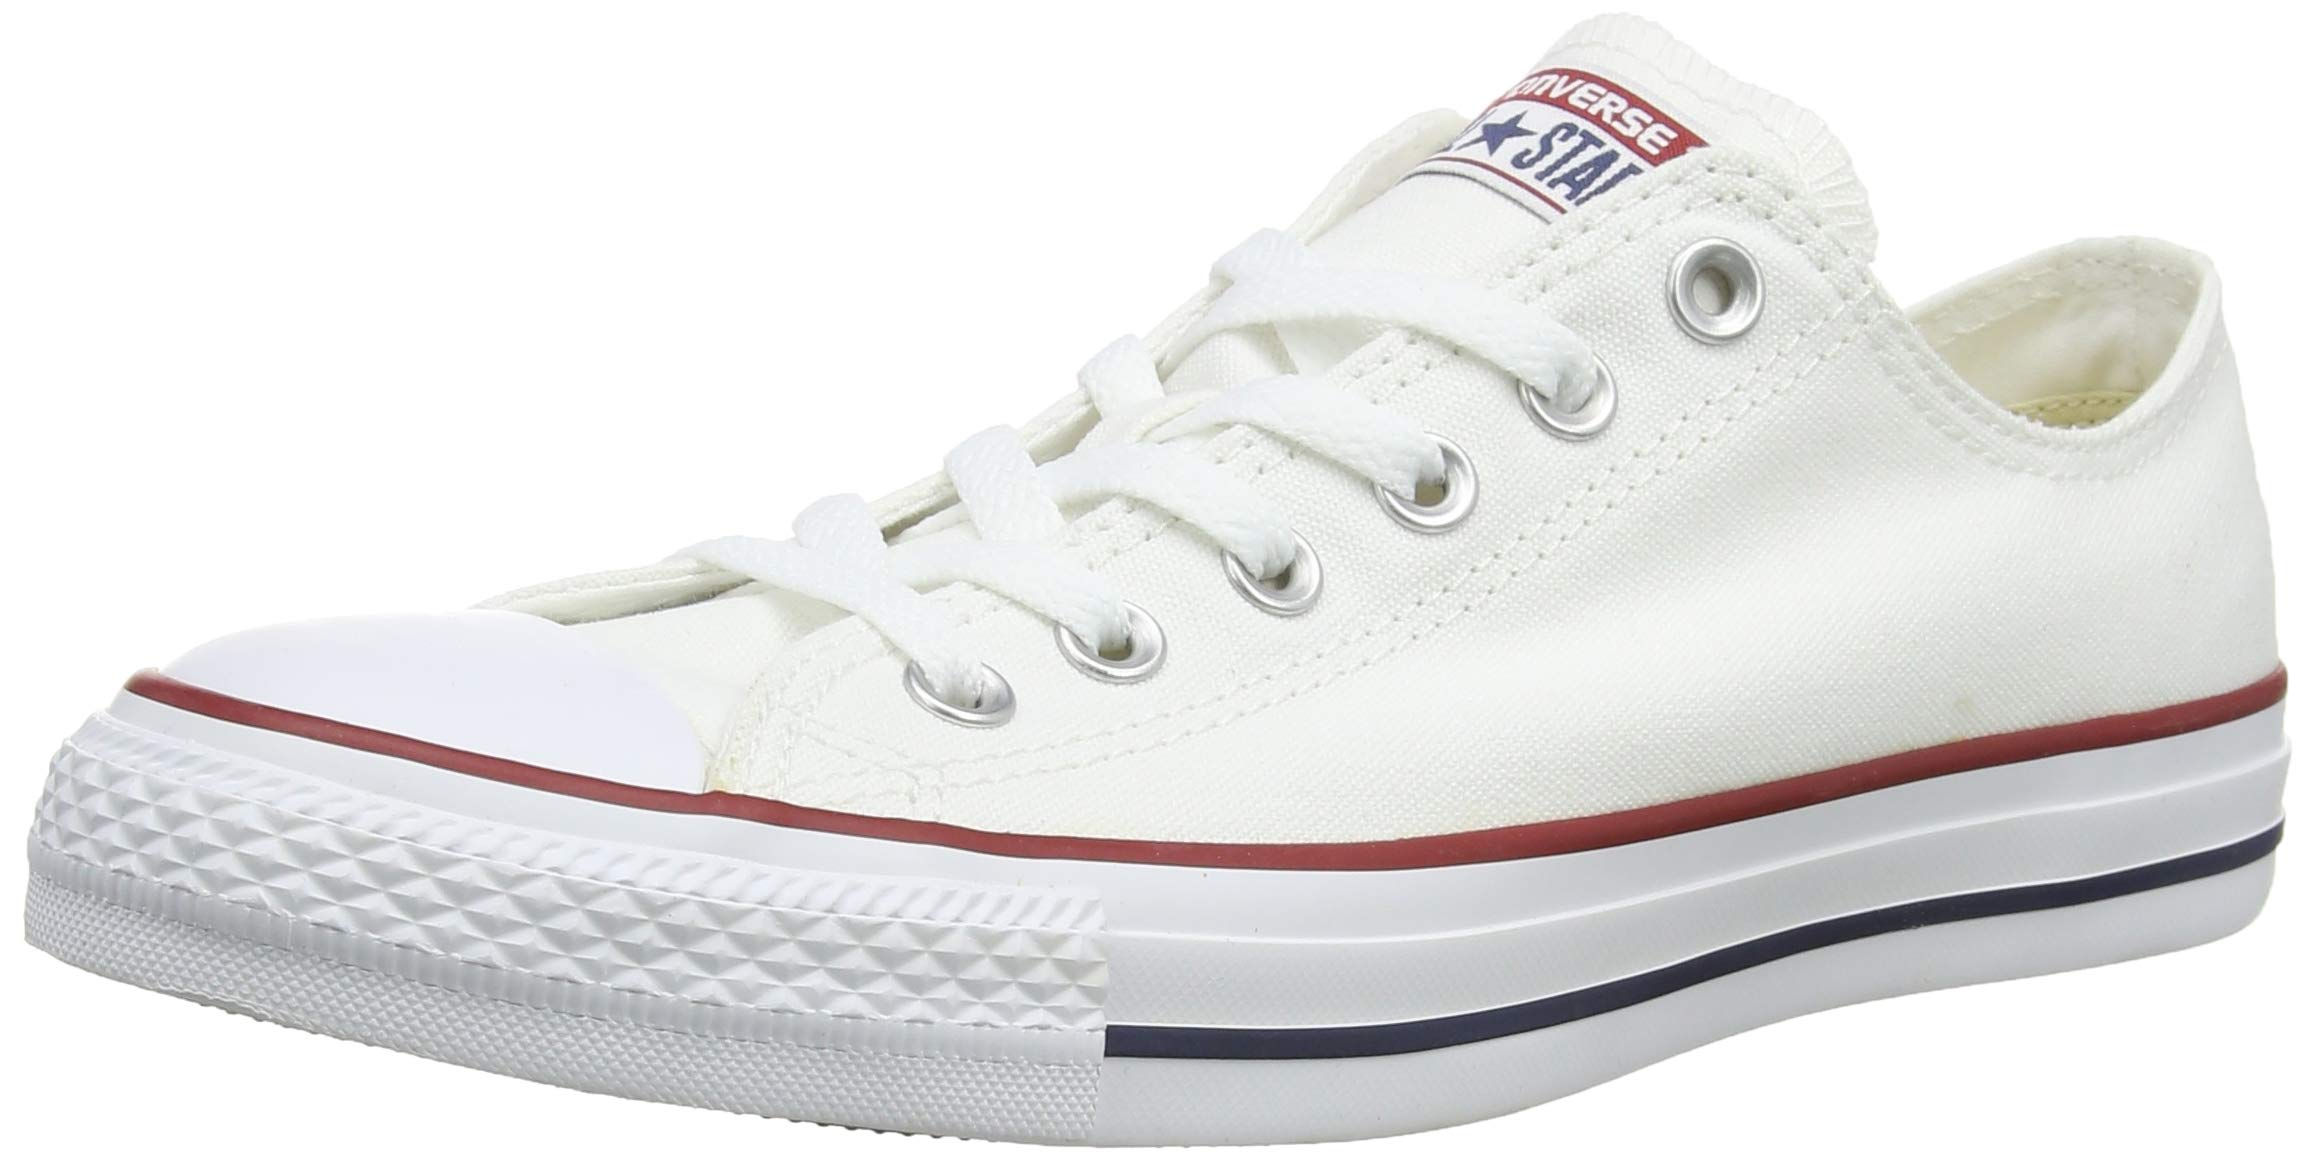 f6411074c54d Converse Unisex Chuck Taylor All Star Low Top Optical White Sneakers - 6  B(M) US Women / 4 D(M) US Men